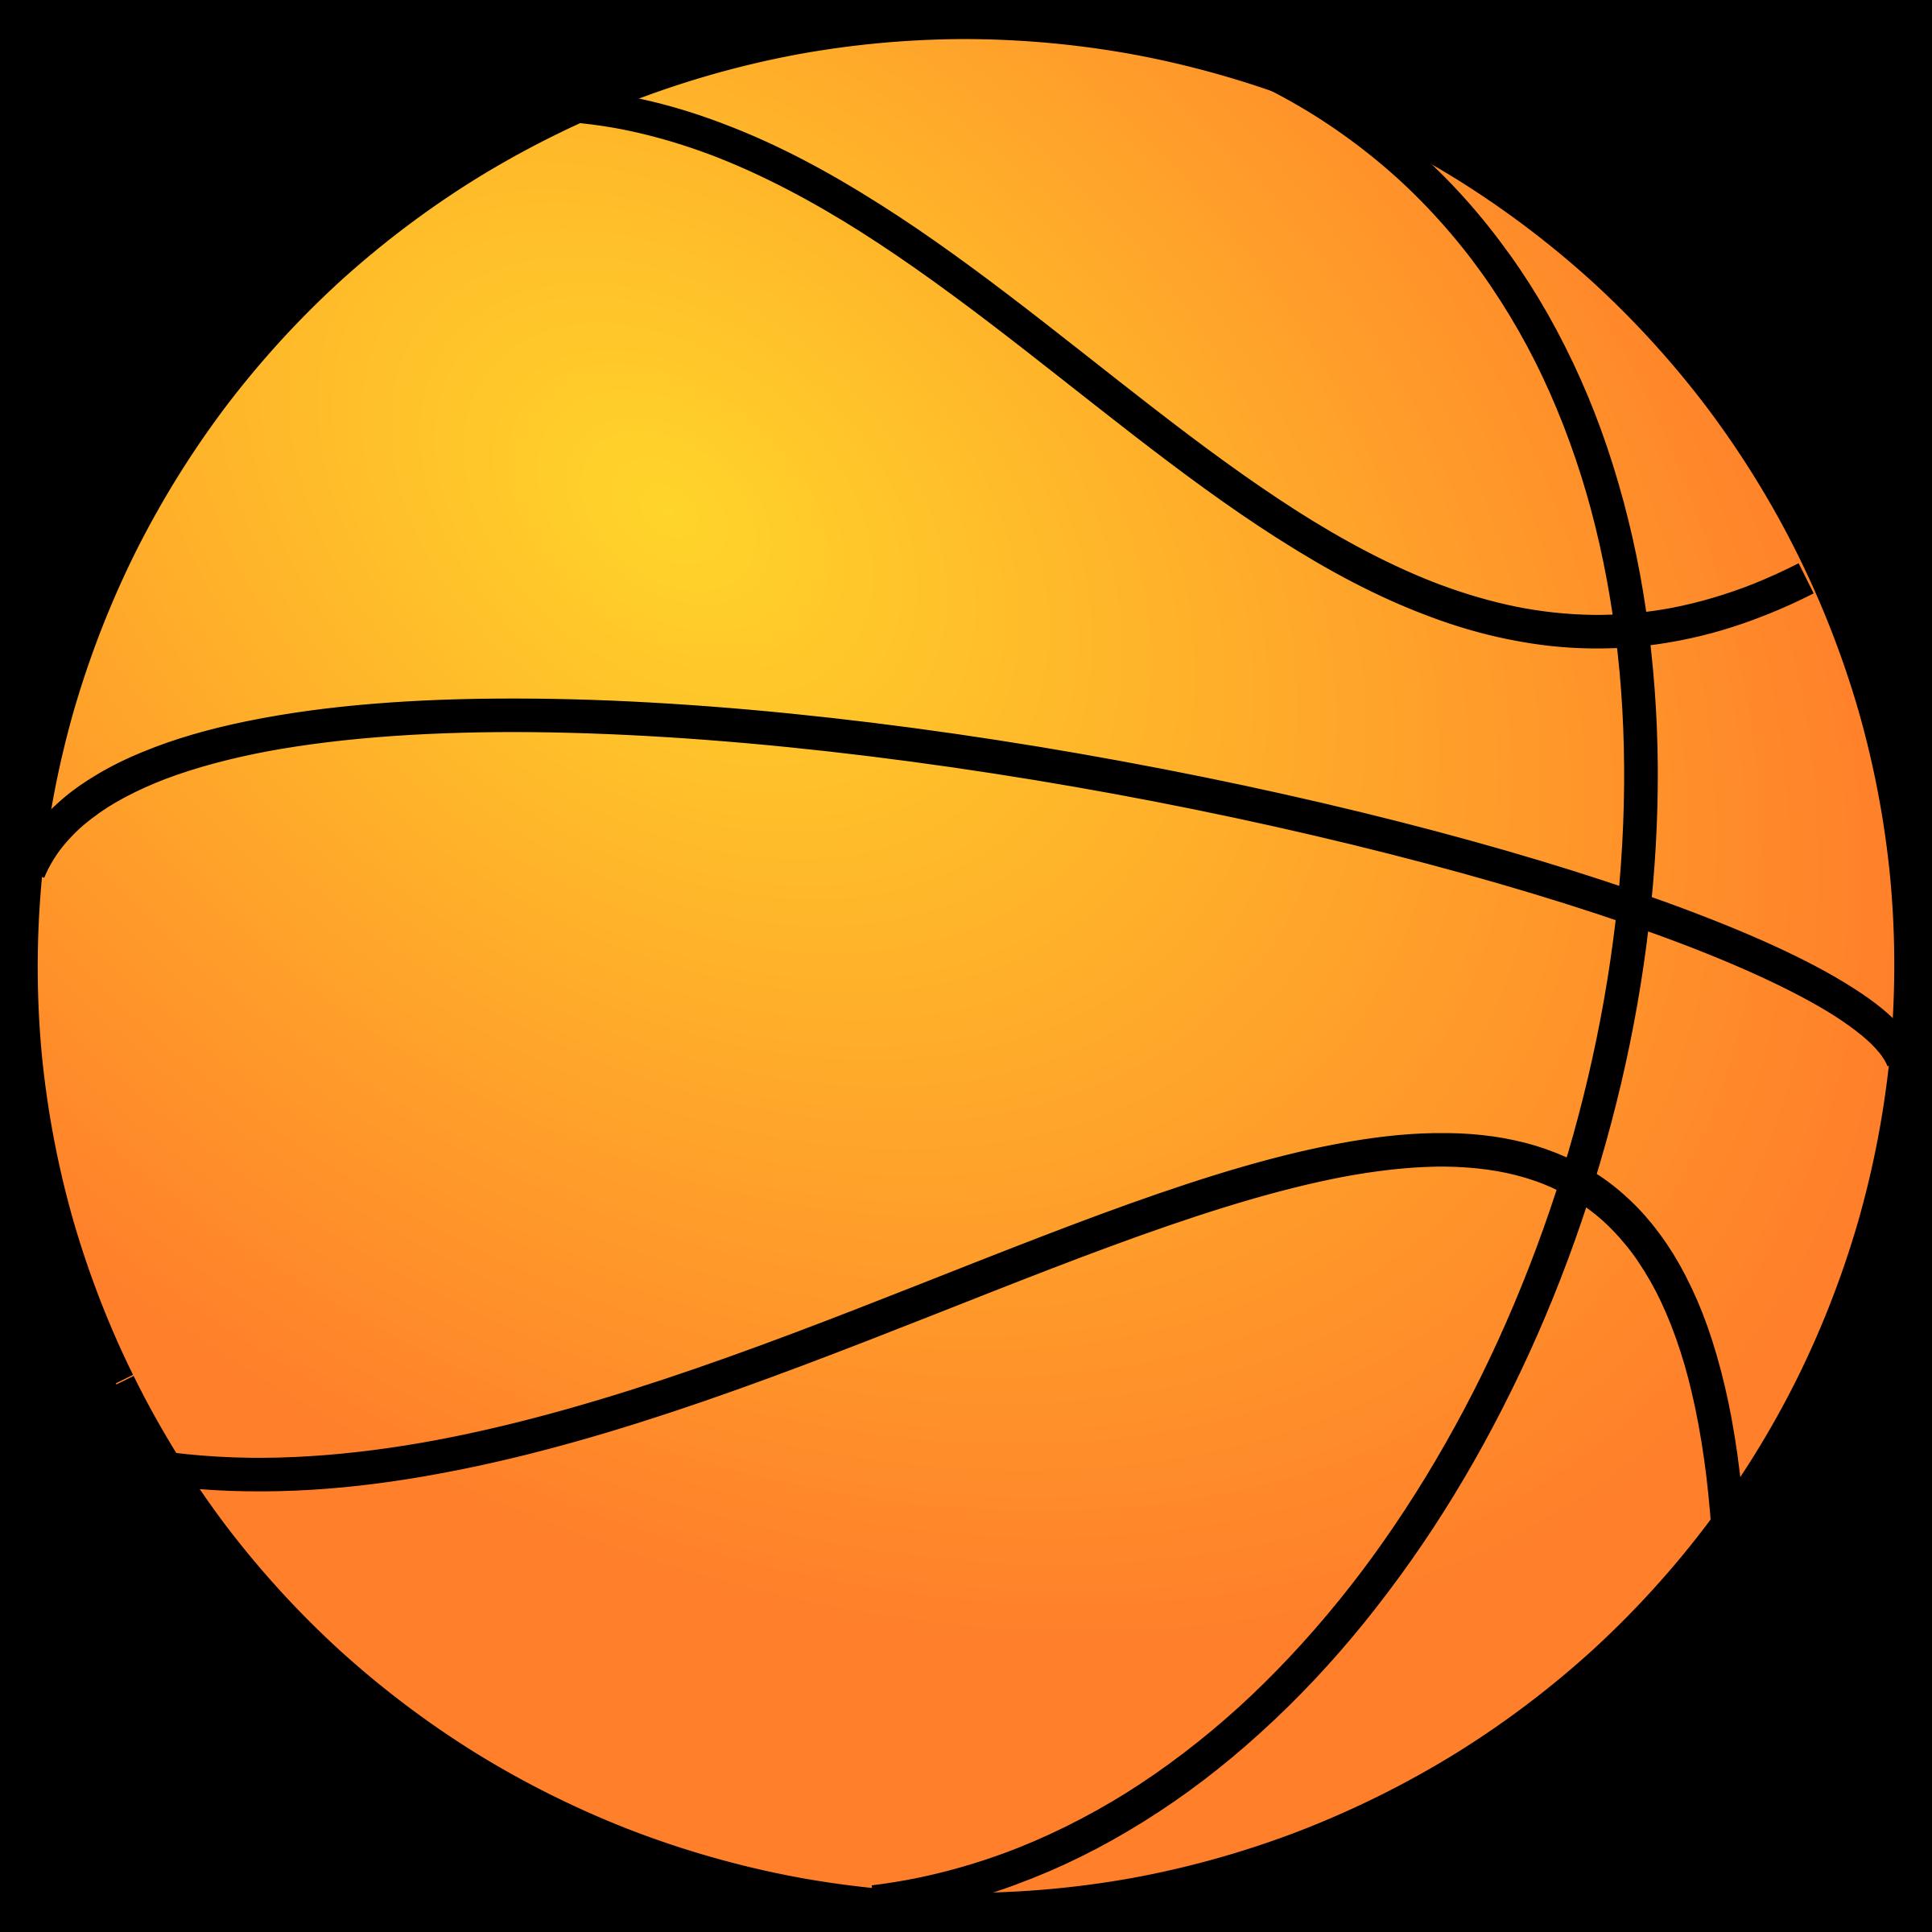 Basketball clipart girl freeuse Mini basketball clipart freeuse